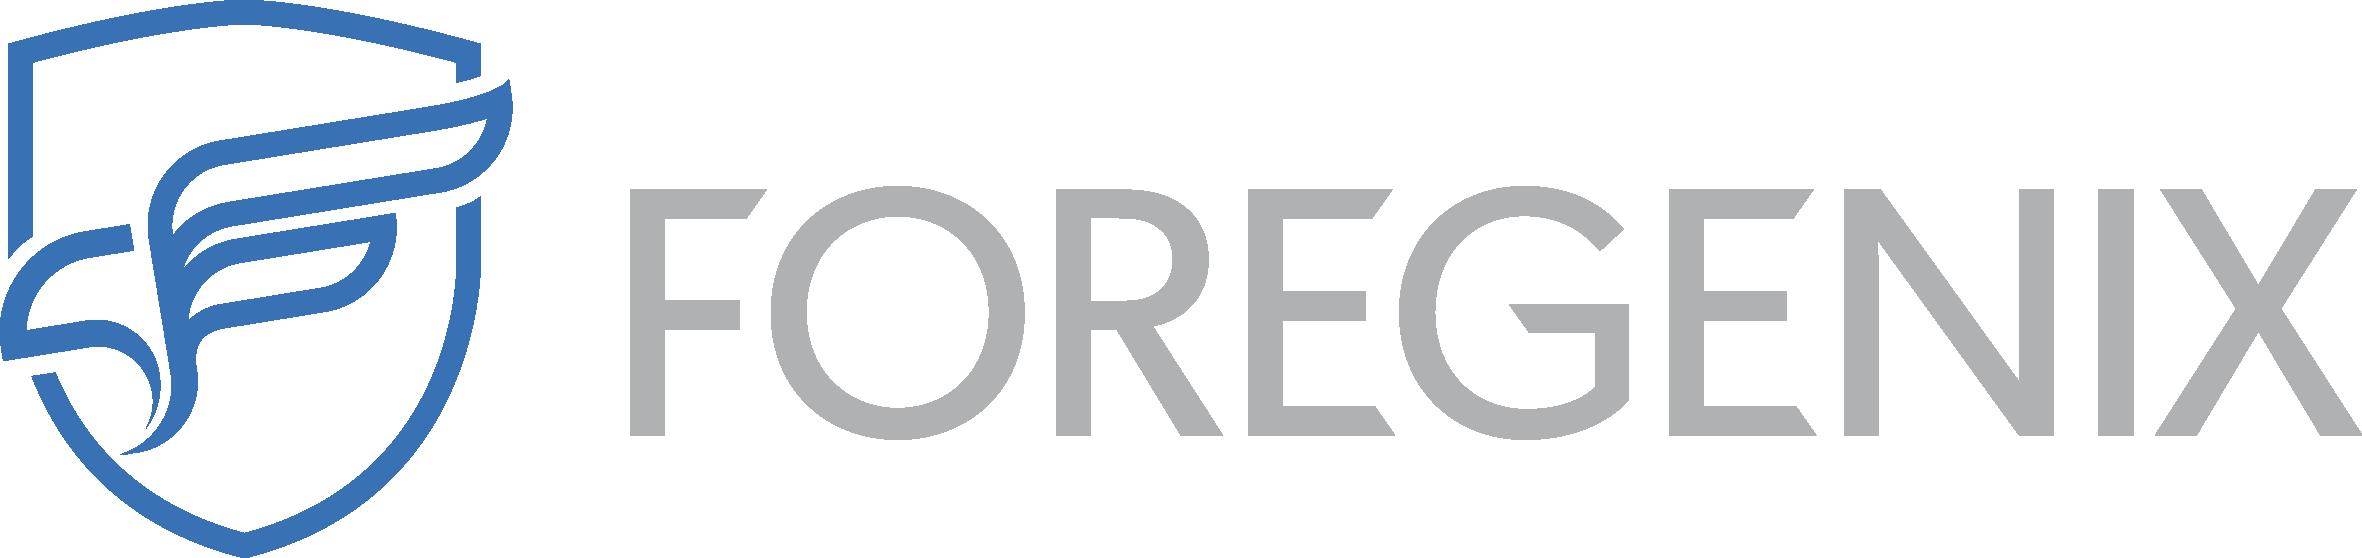 Foregenix_Logo_Horizontal_Colour-1